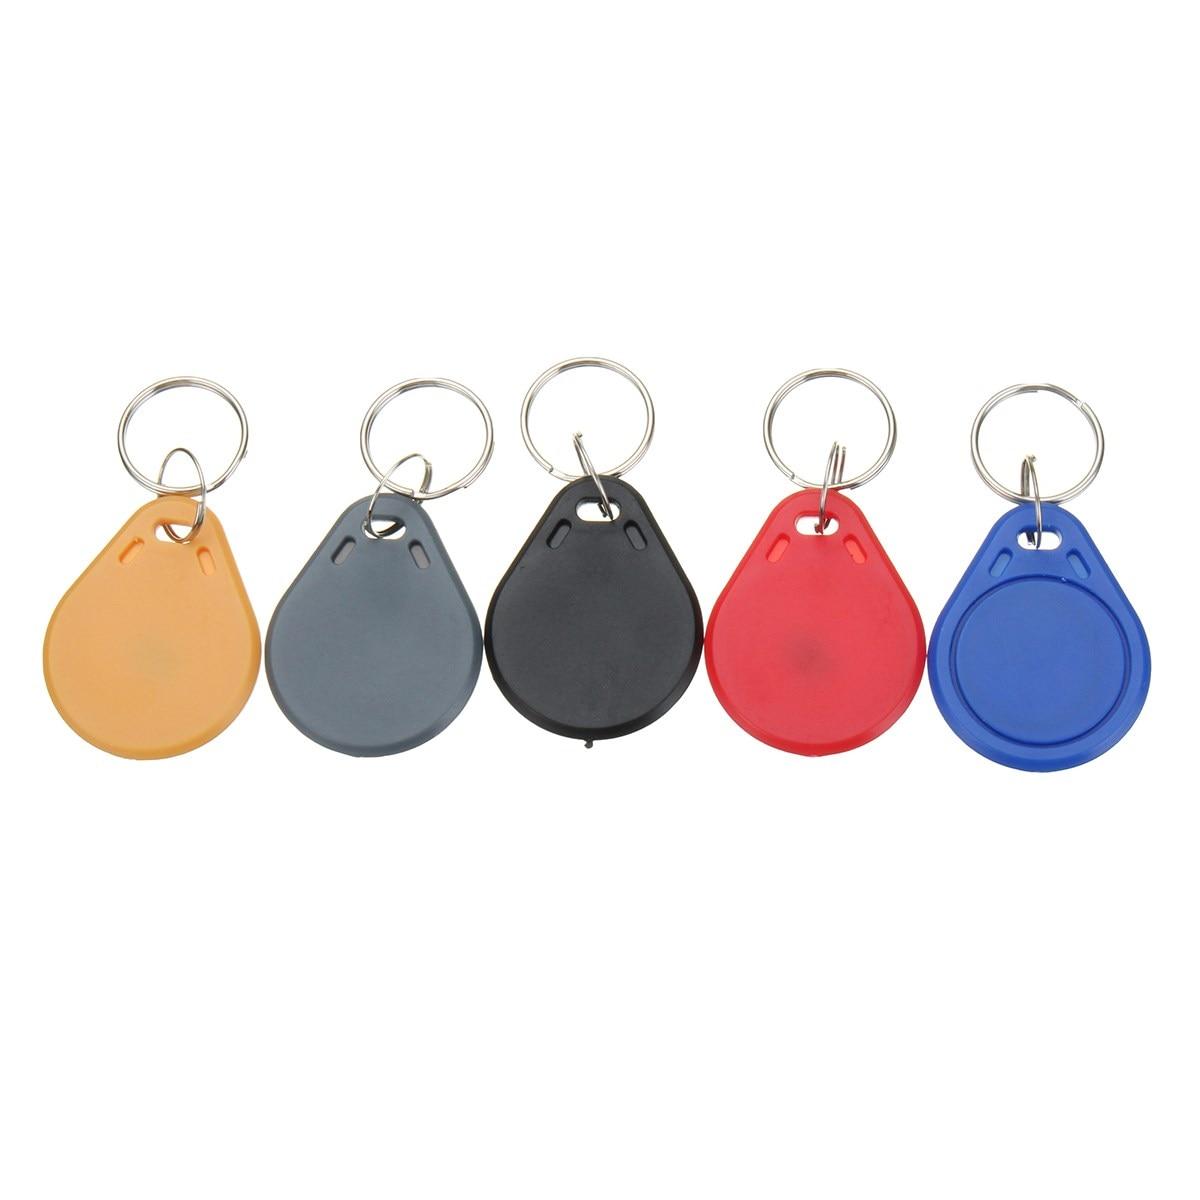 100pcs 13.56MHZ Classic1K ABS ISO IC Key Fobs Access Control Keychain RFID Smart Card Tag iso 100 в перми